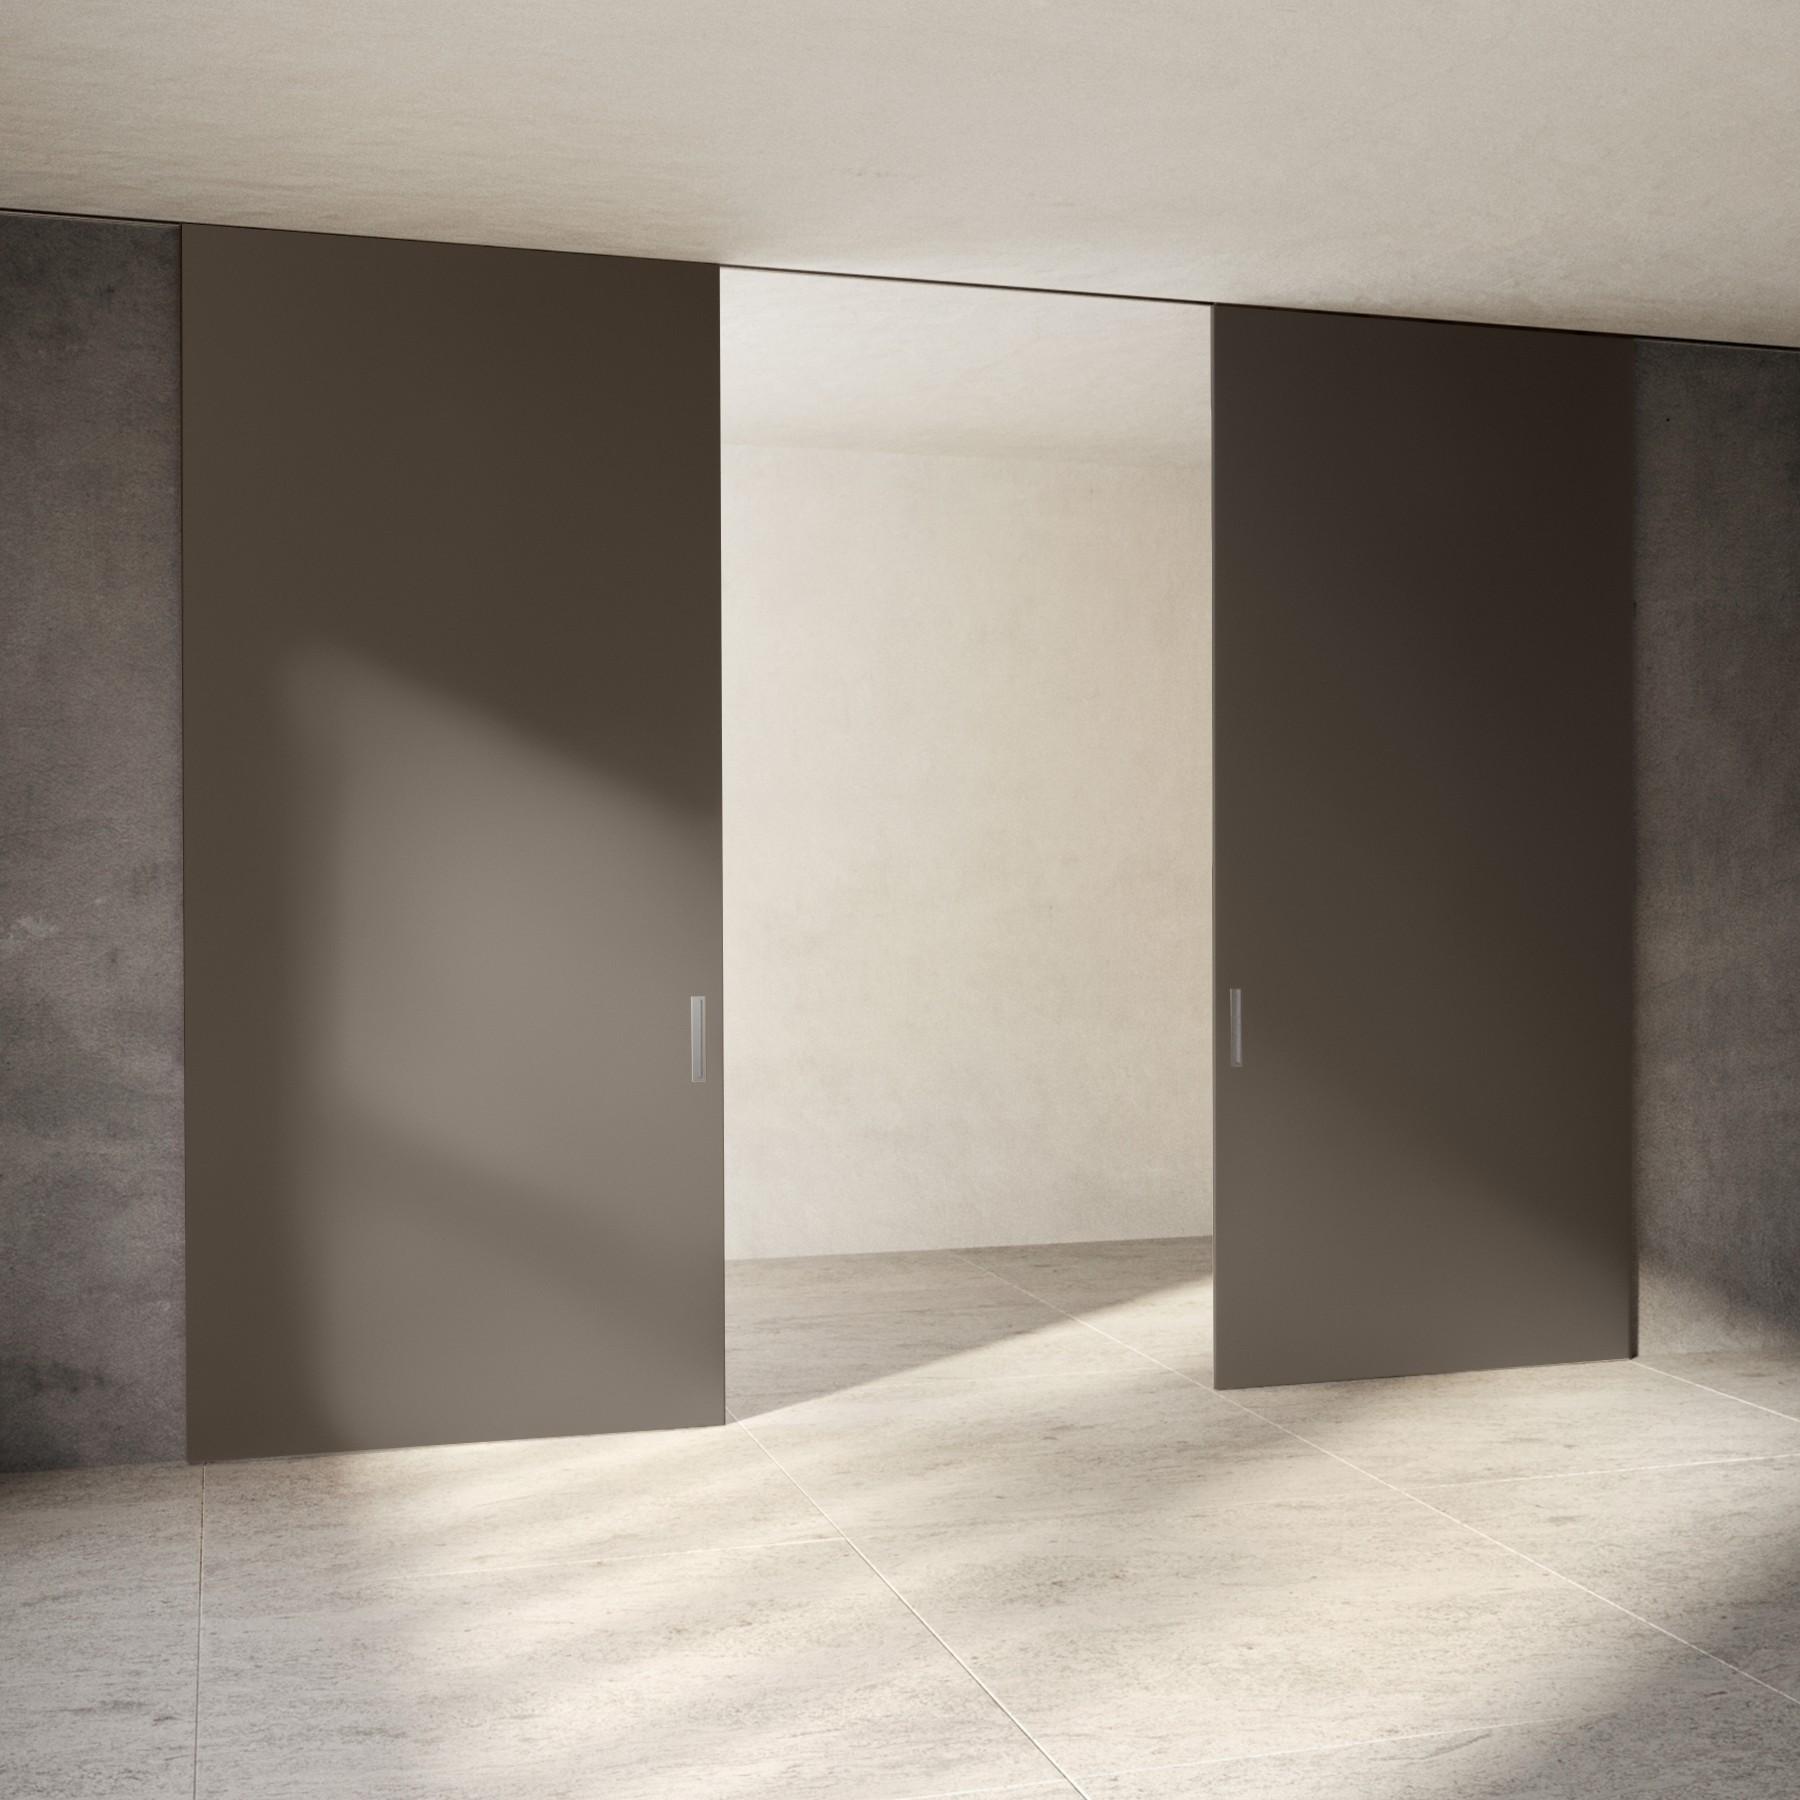 Scenario Lignum Exit Ombra Dark Laccato ULTRAlucido